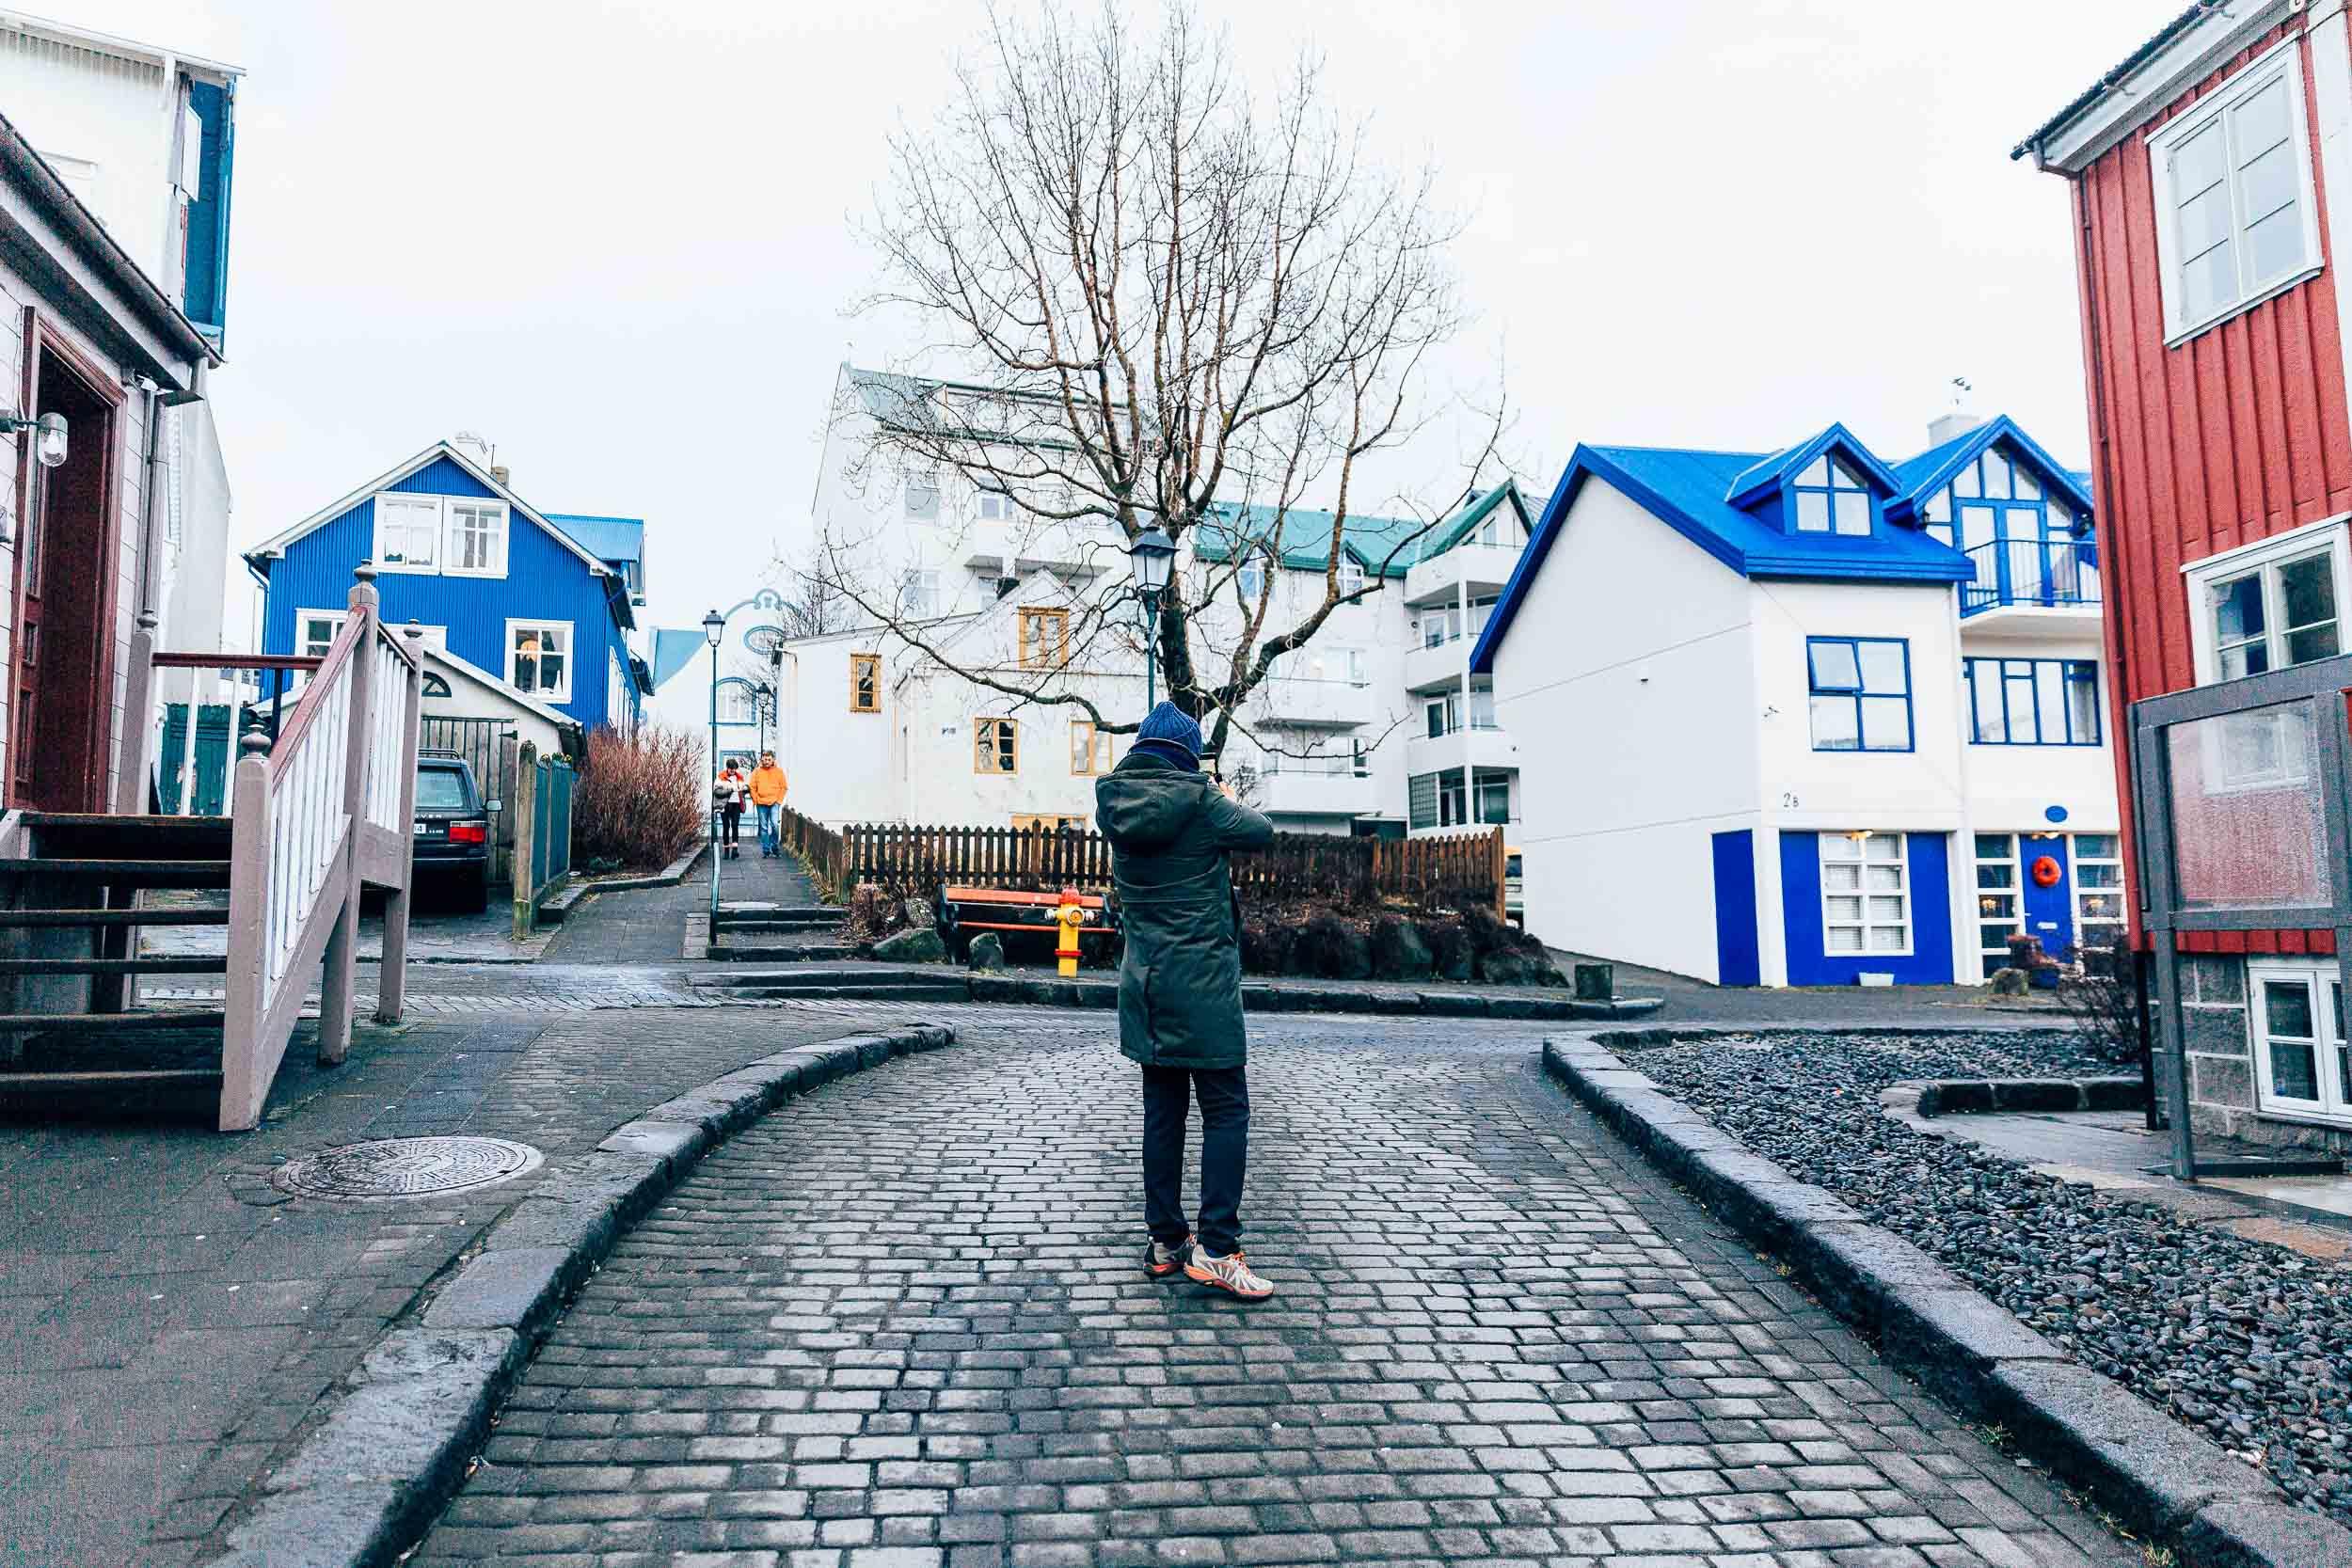 02_2019_Iceland-24.jpg